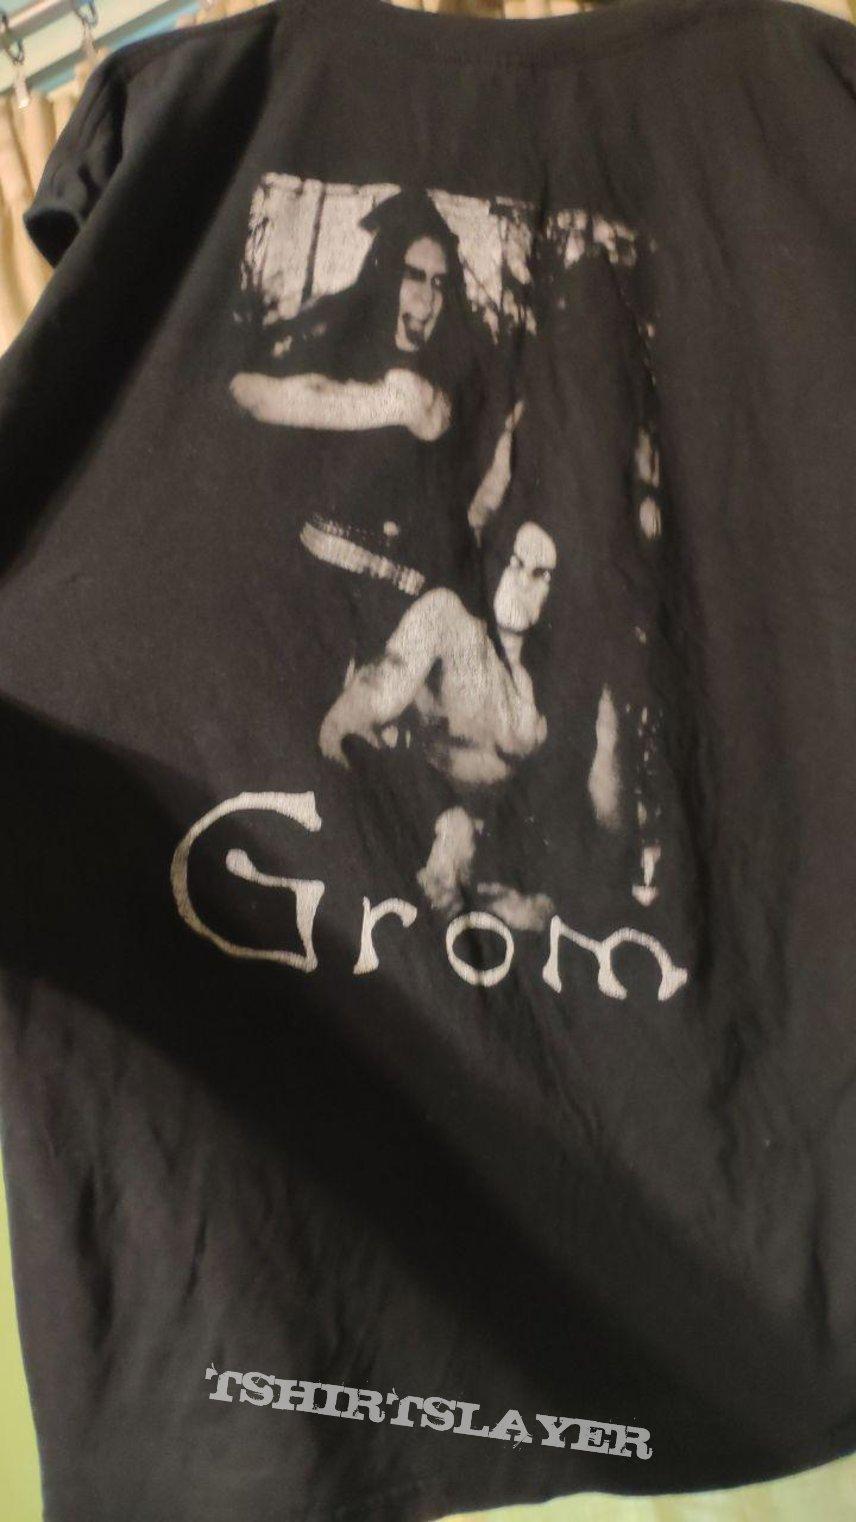 Behemoth - Grom 2011 PHD